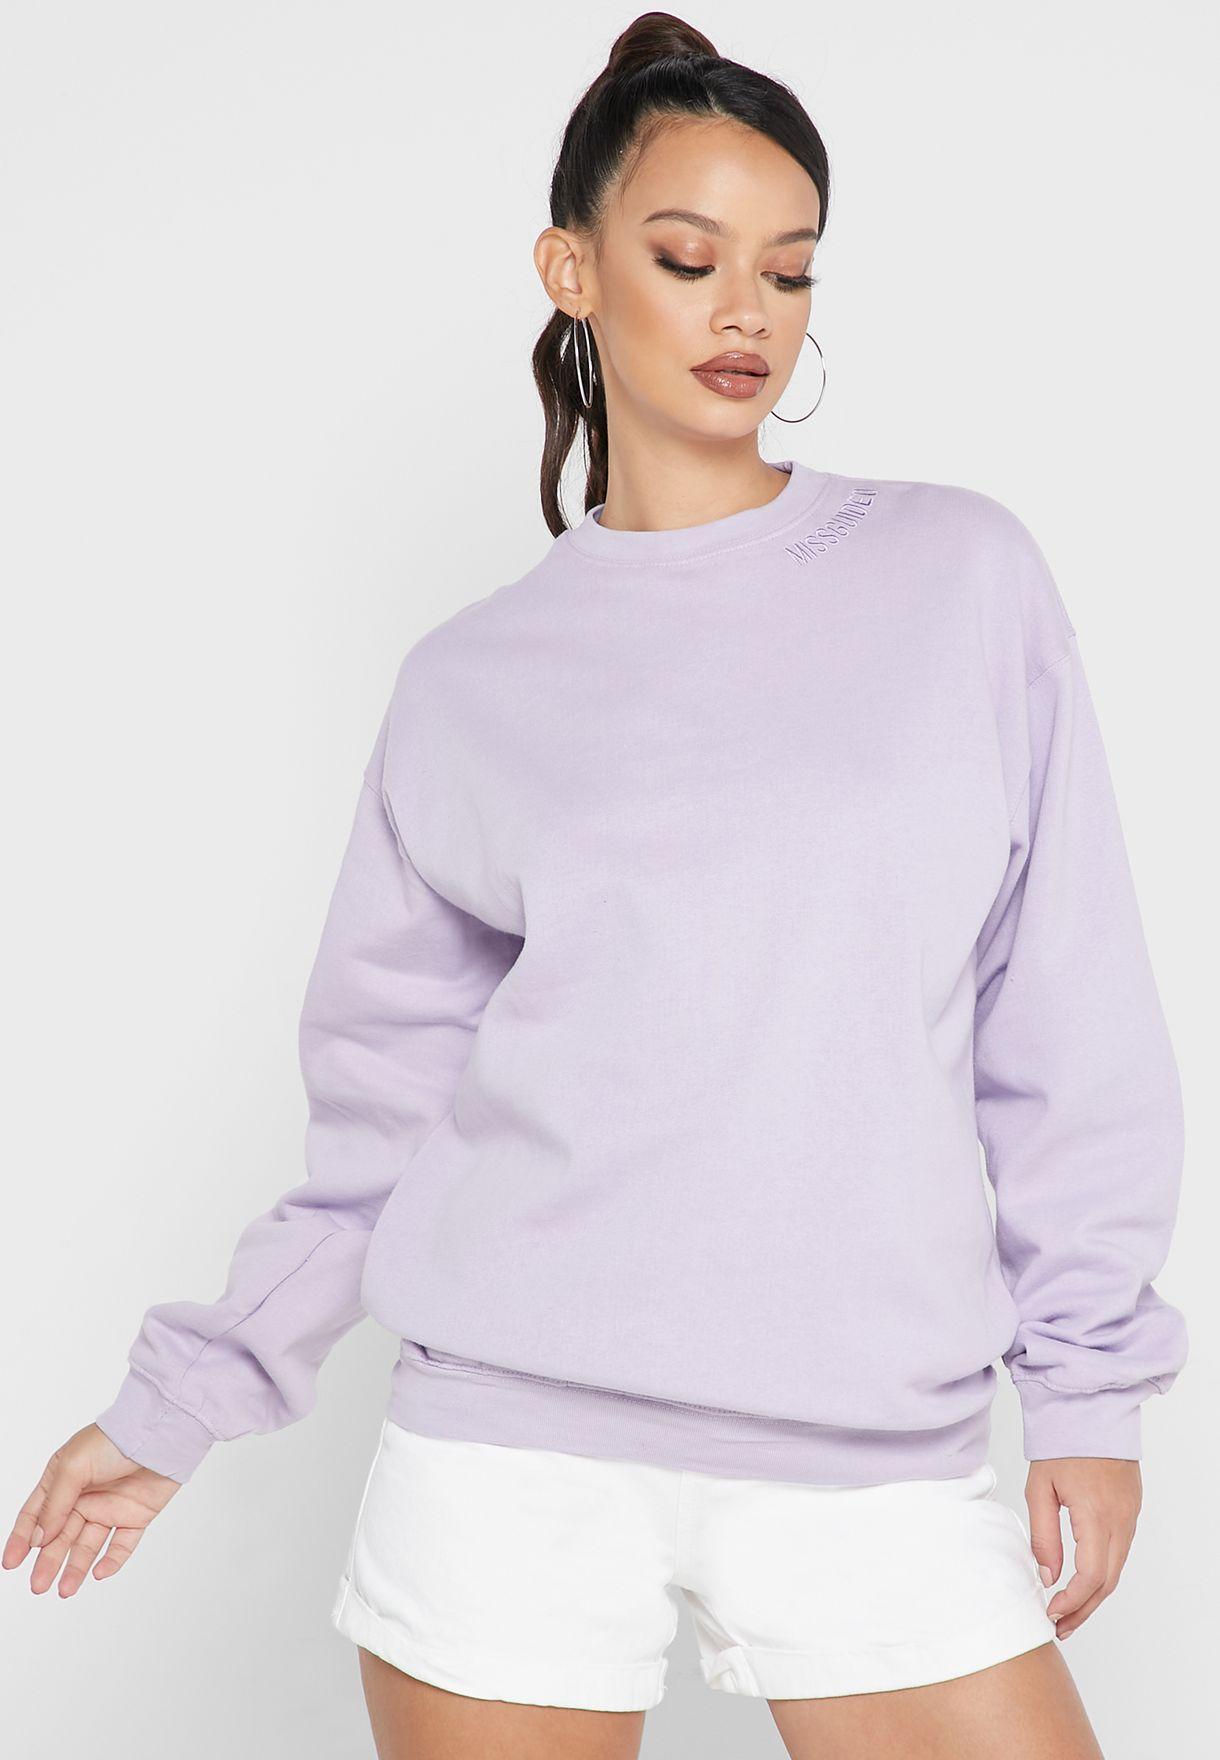 Tonal Neck Embroidery Oversized Sweater